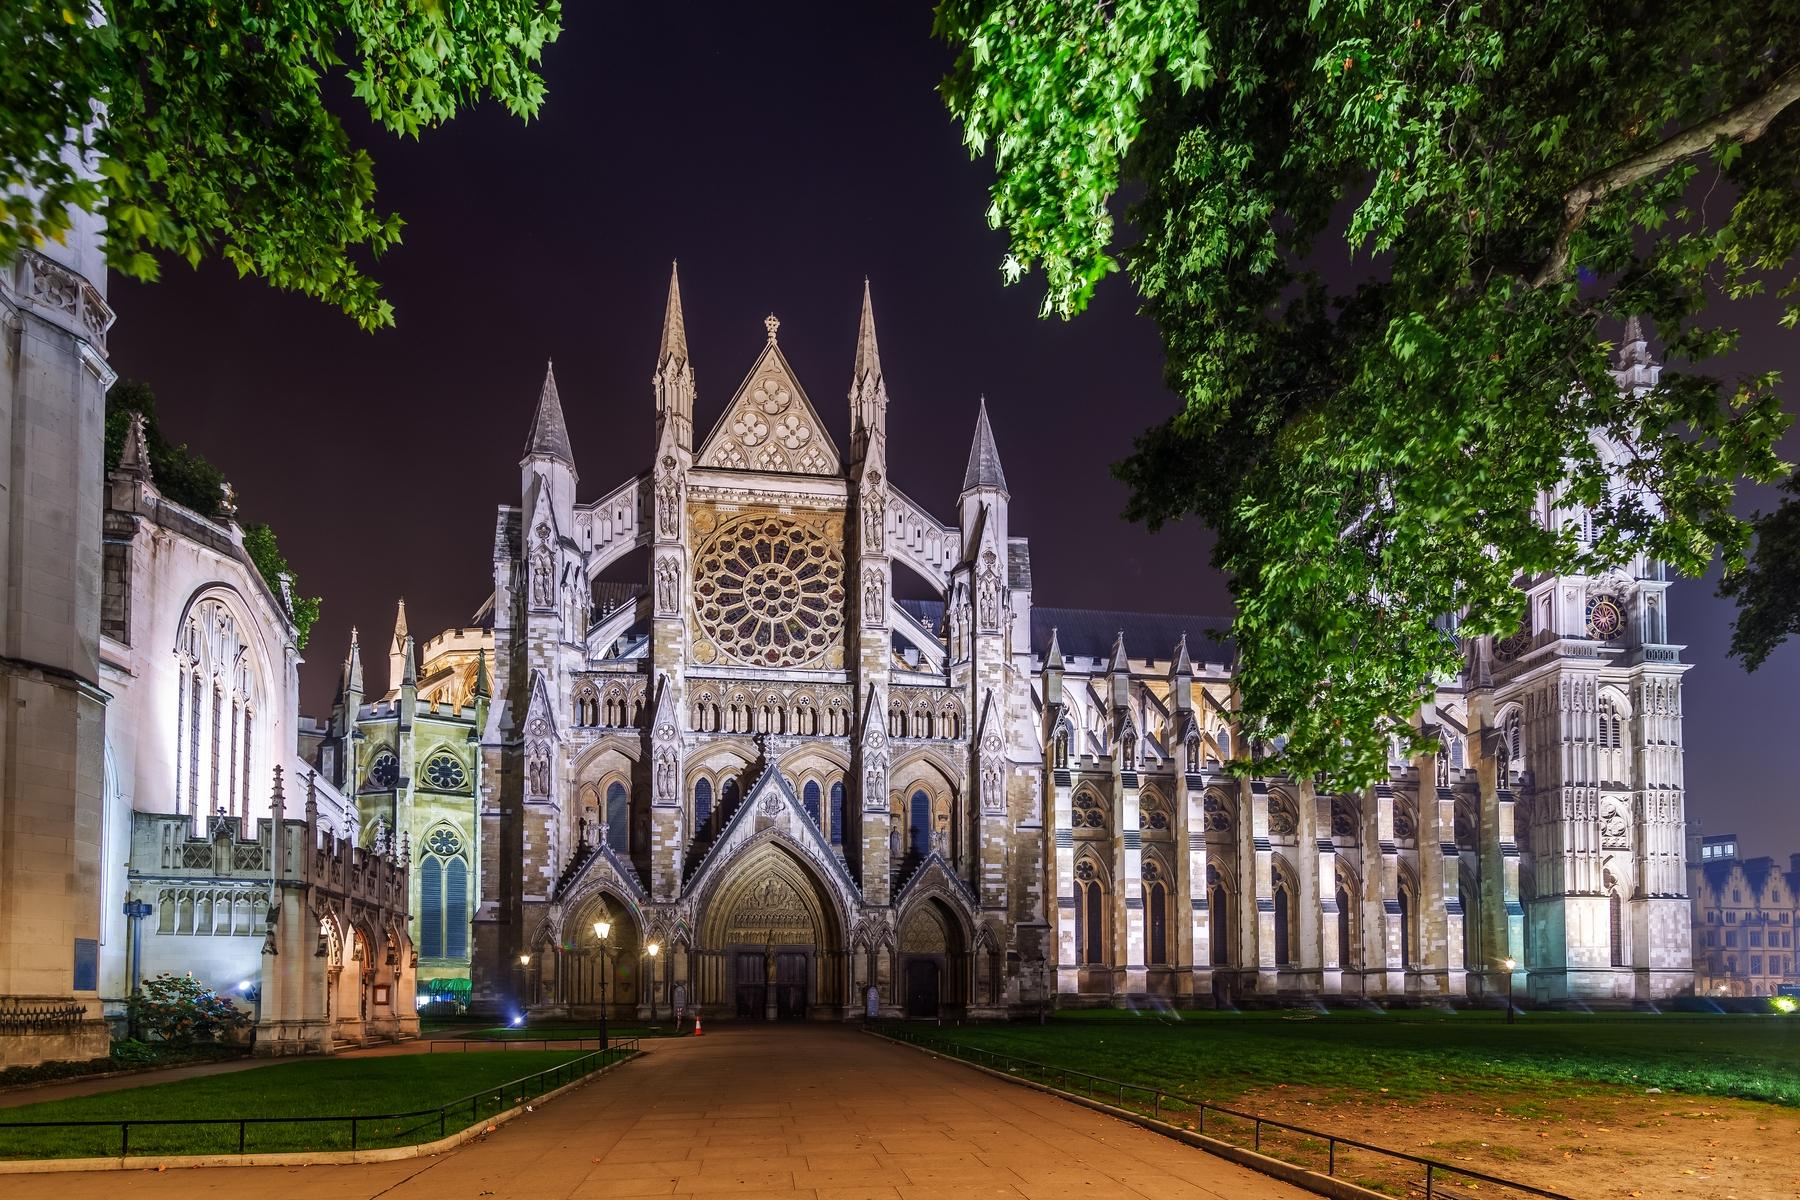 The breathtaking Westminster Abbey, London - לונדון